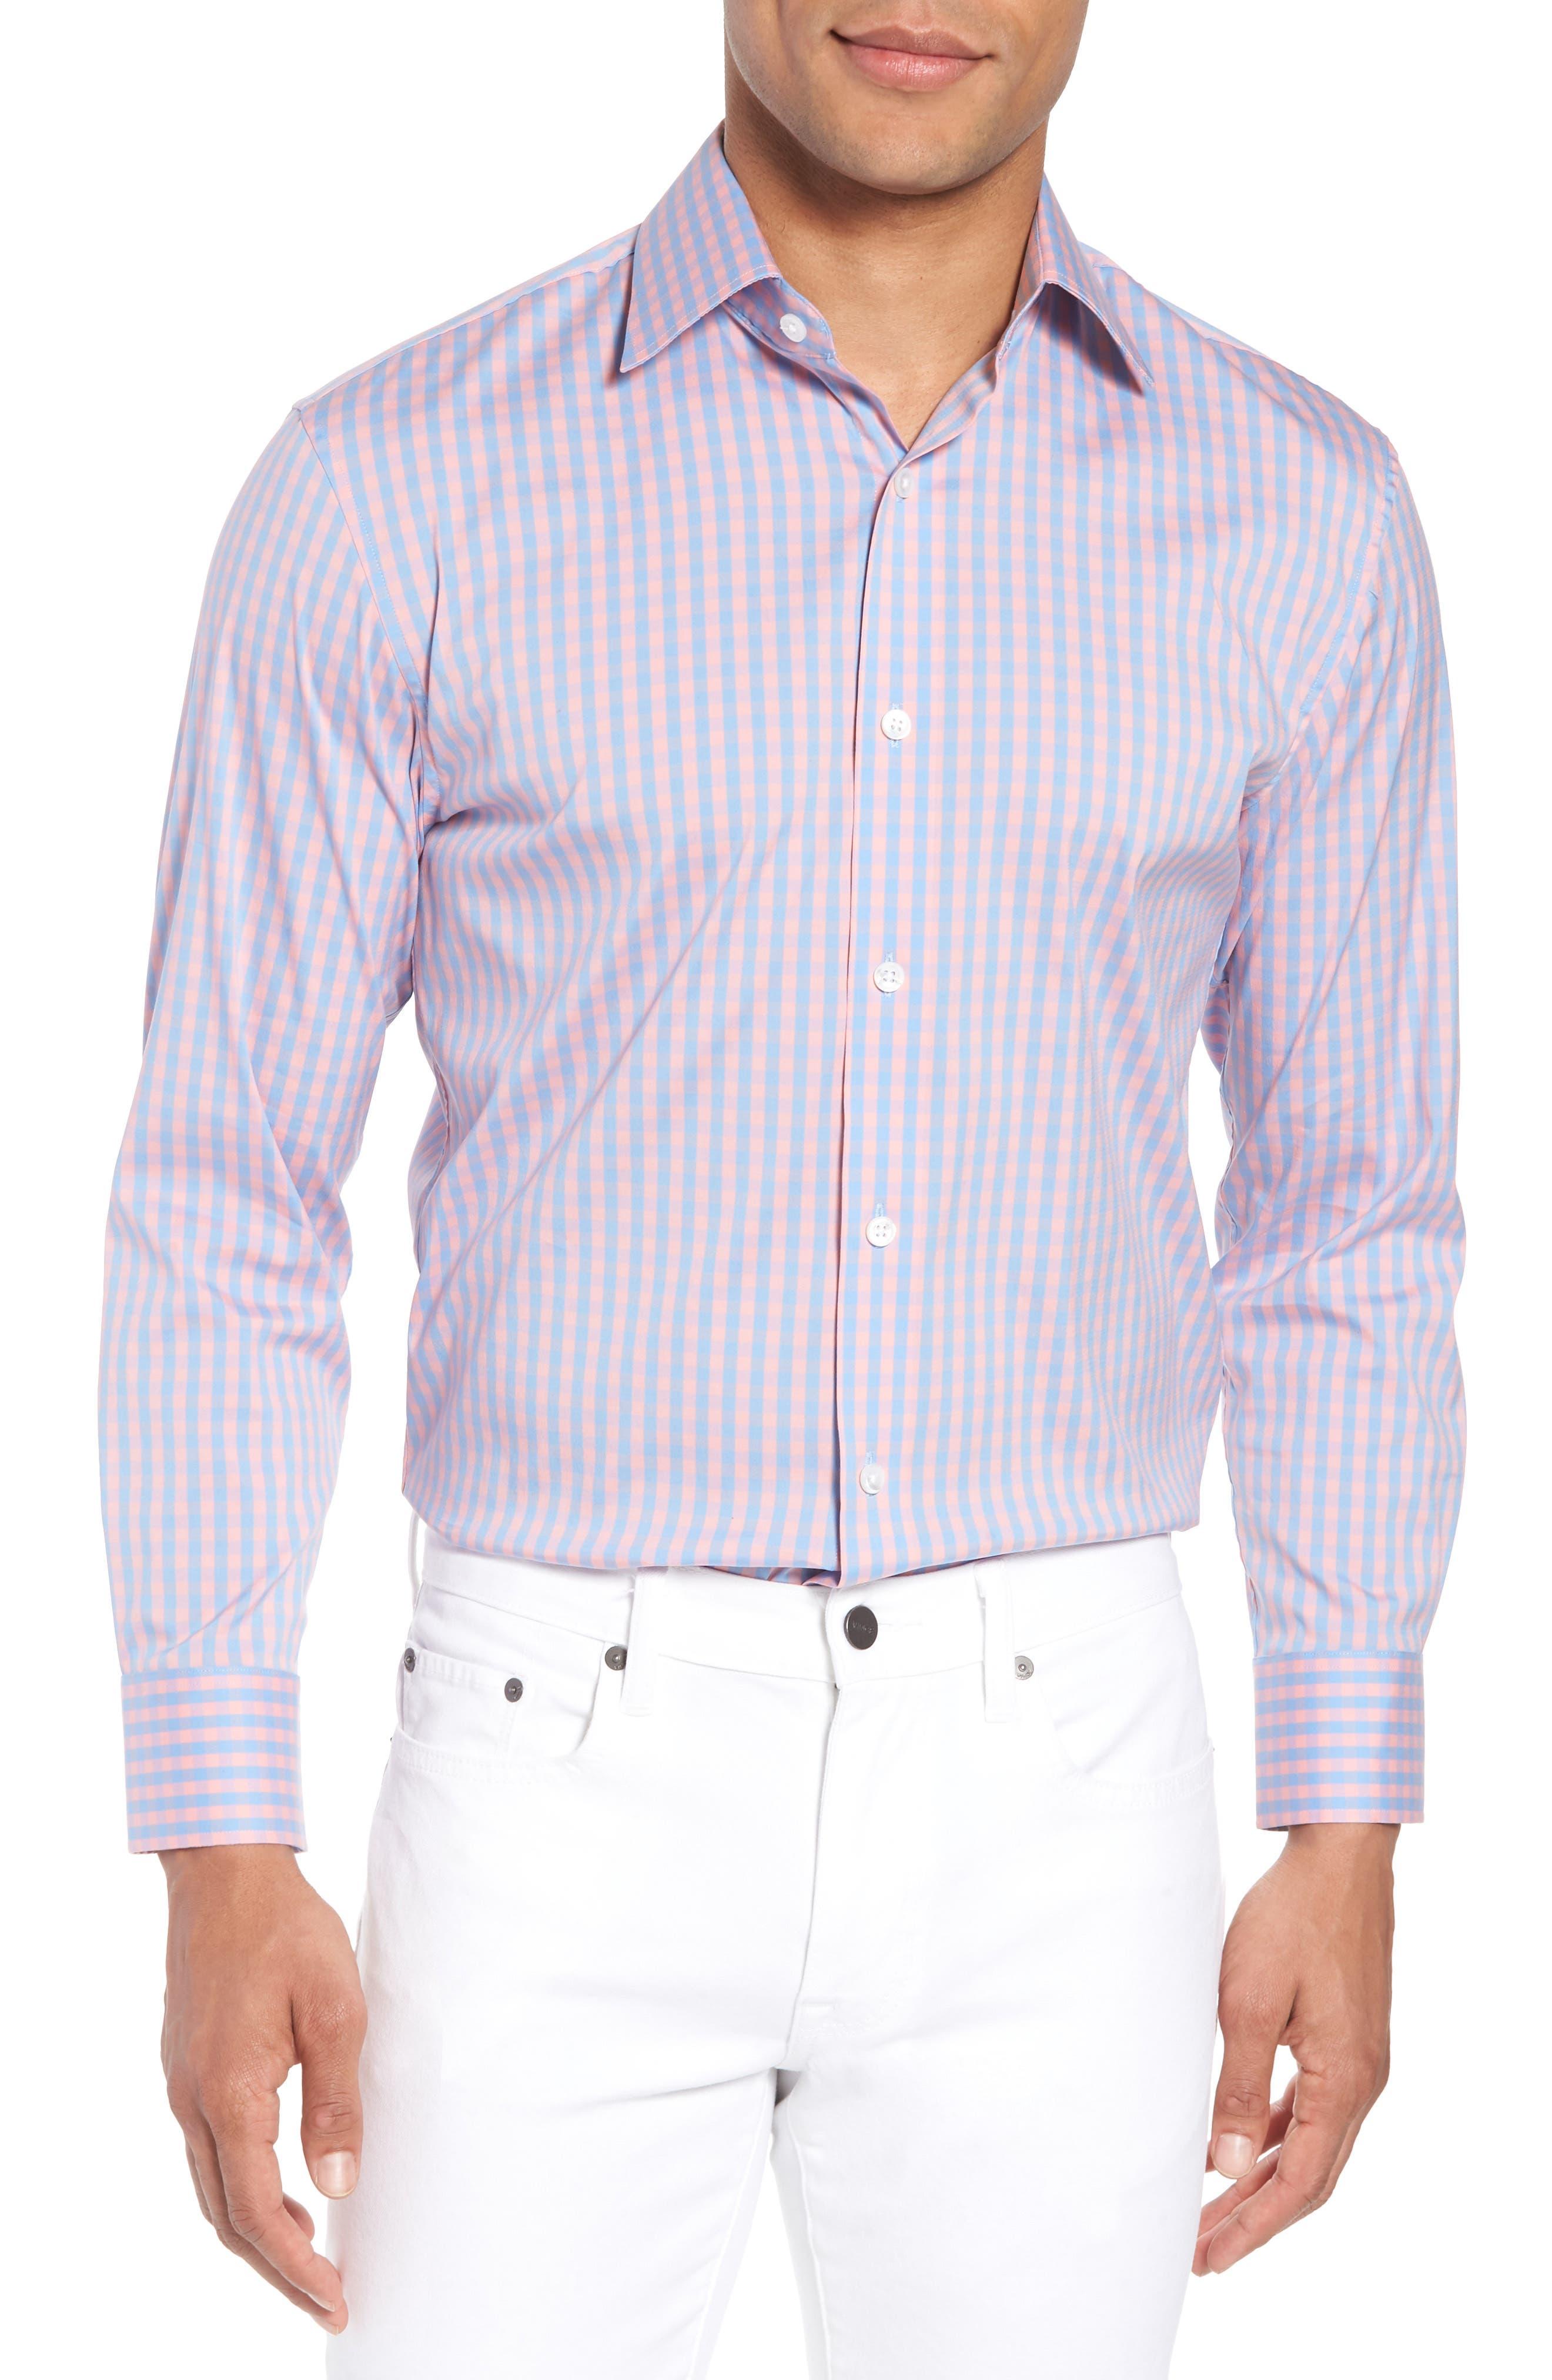 Jetsetter Slim Fit Stretch Check Dress Shirt,                         Main,                         color, 650